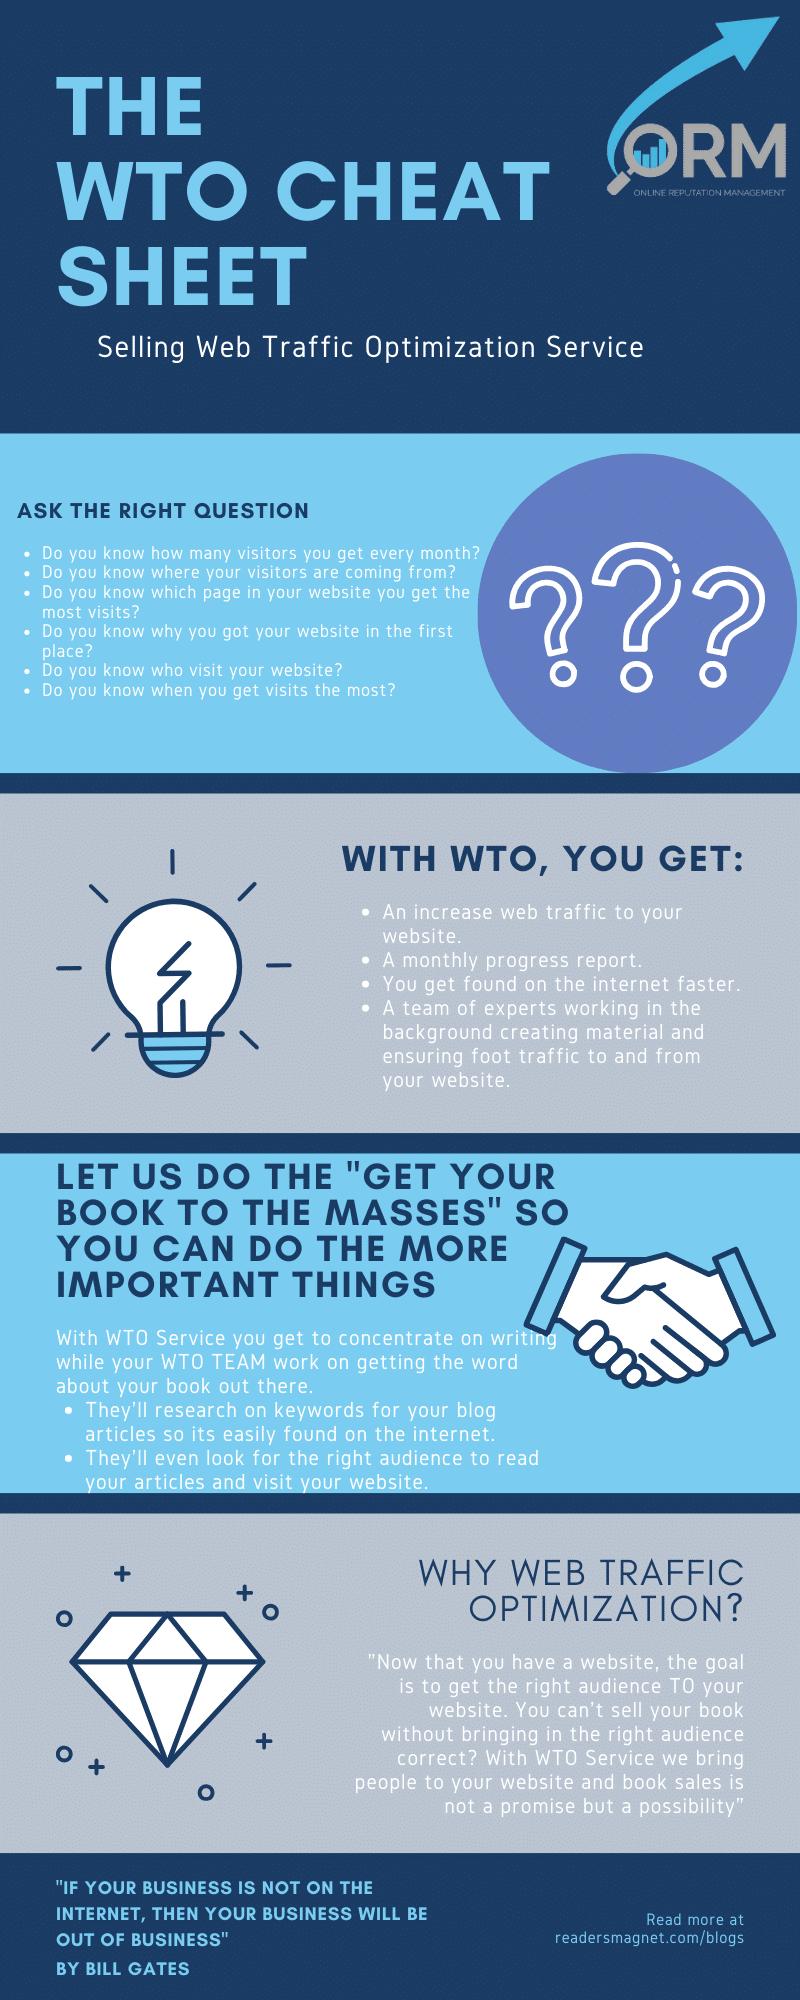 WTO Cheat Sheet one